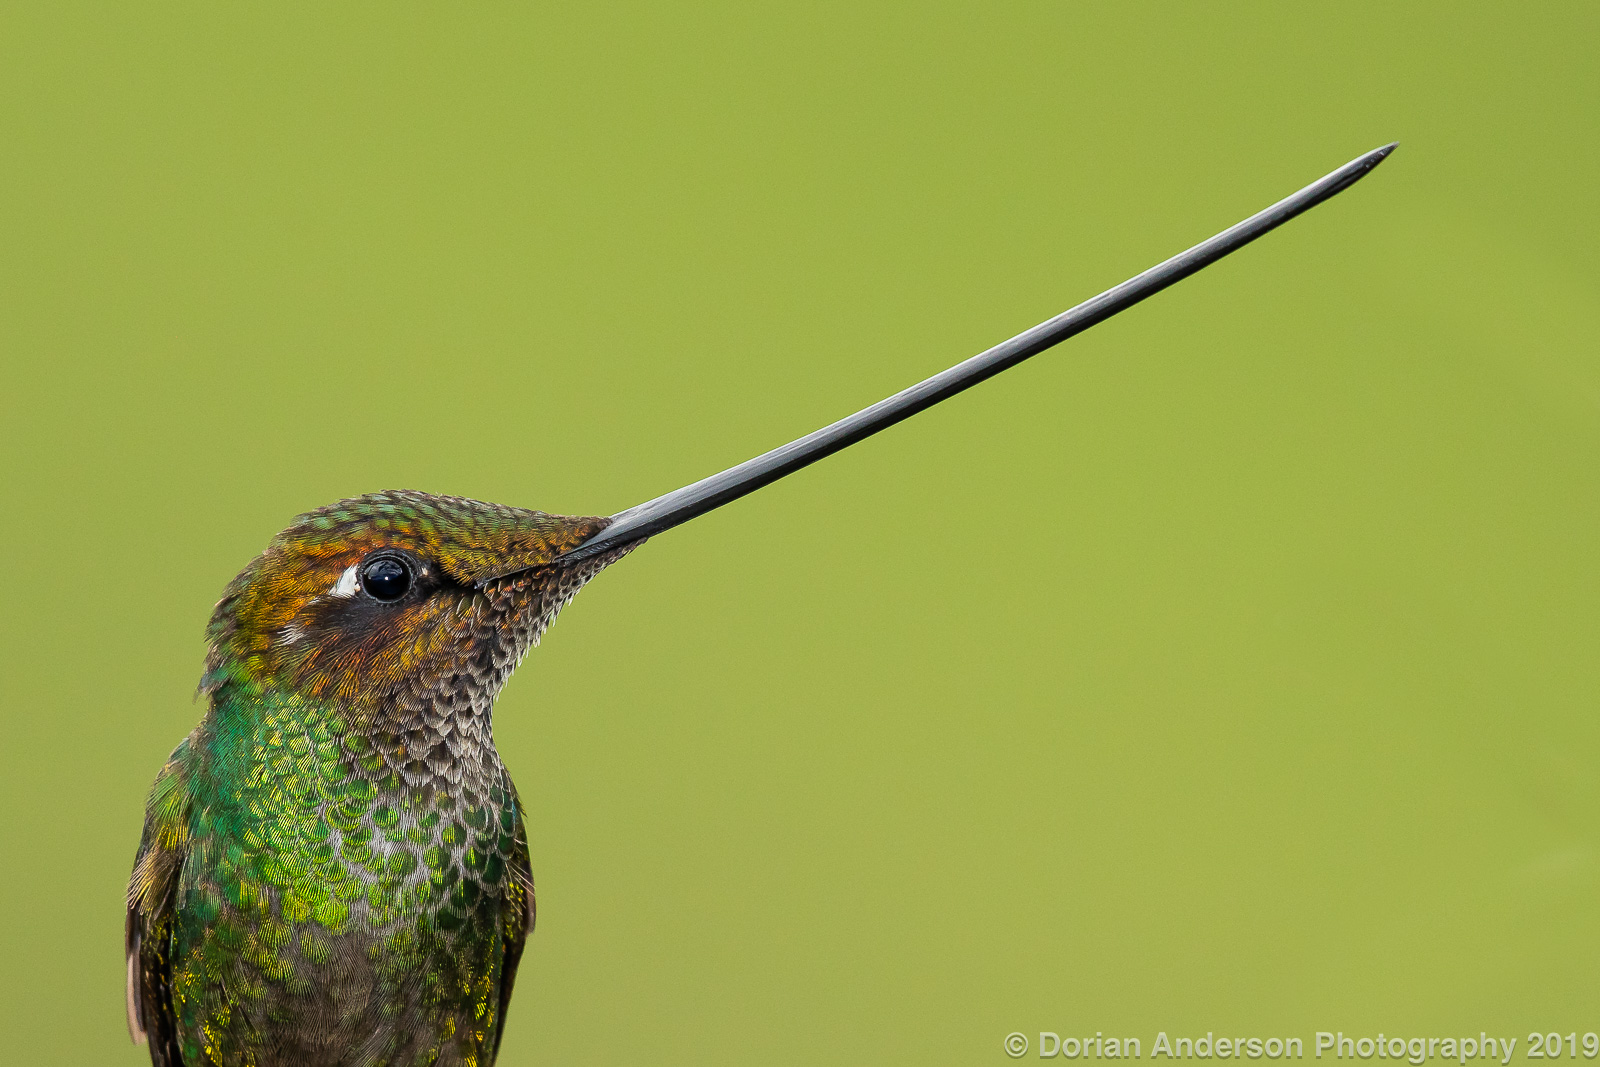 Name:  sword-billed hummingbird head 070319.jpg Views: 148 Size:  491.1 KB